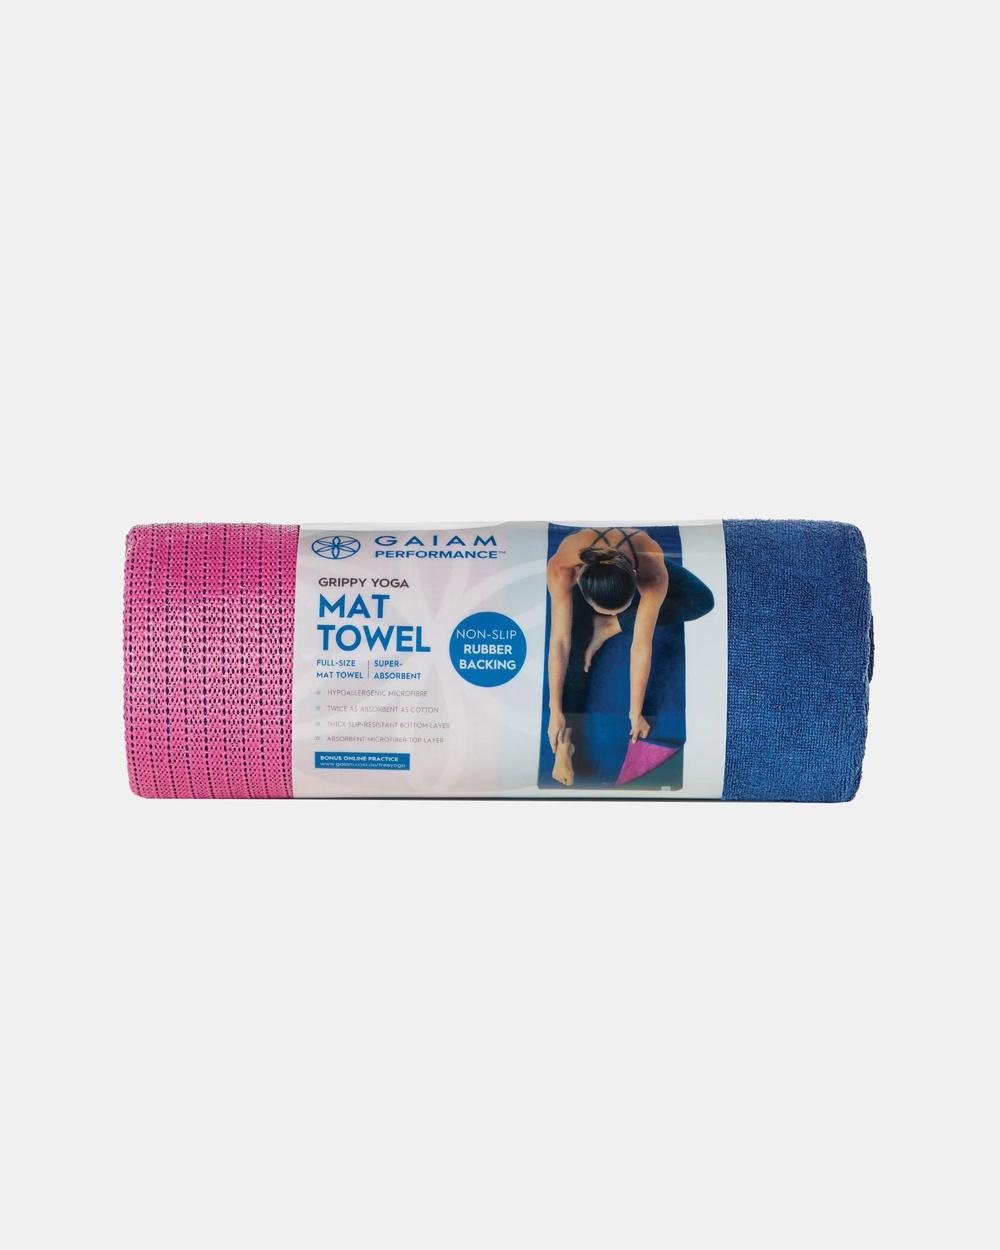 Gaiam Performance Grippy Yoga Mat Towel Accessories Blue